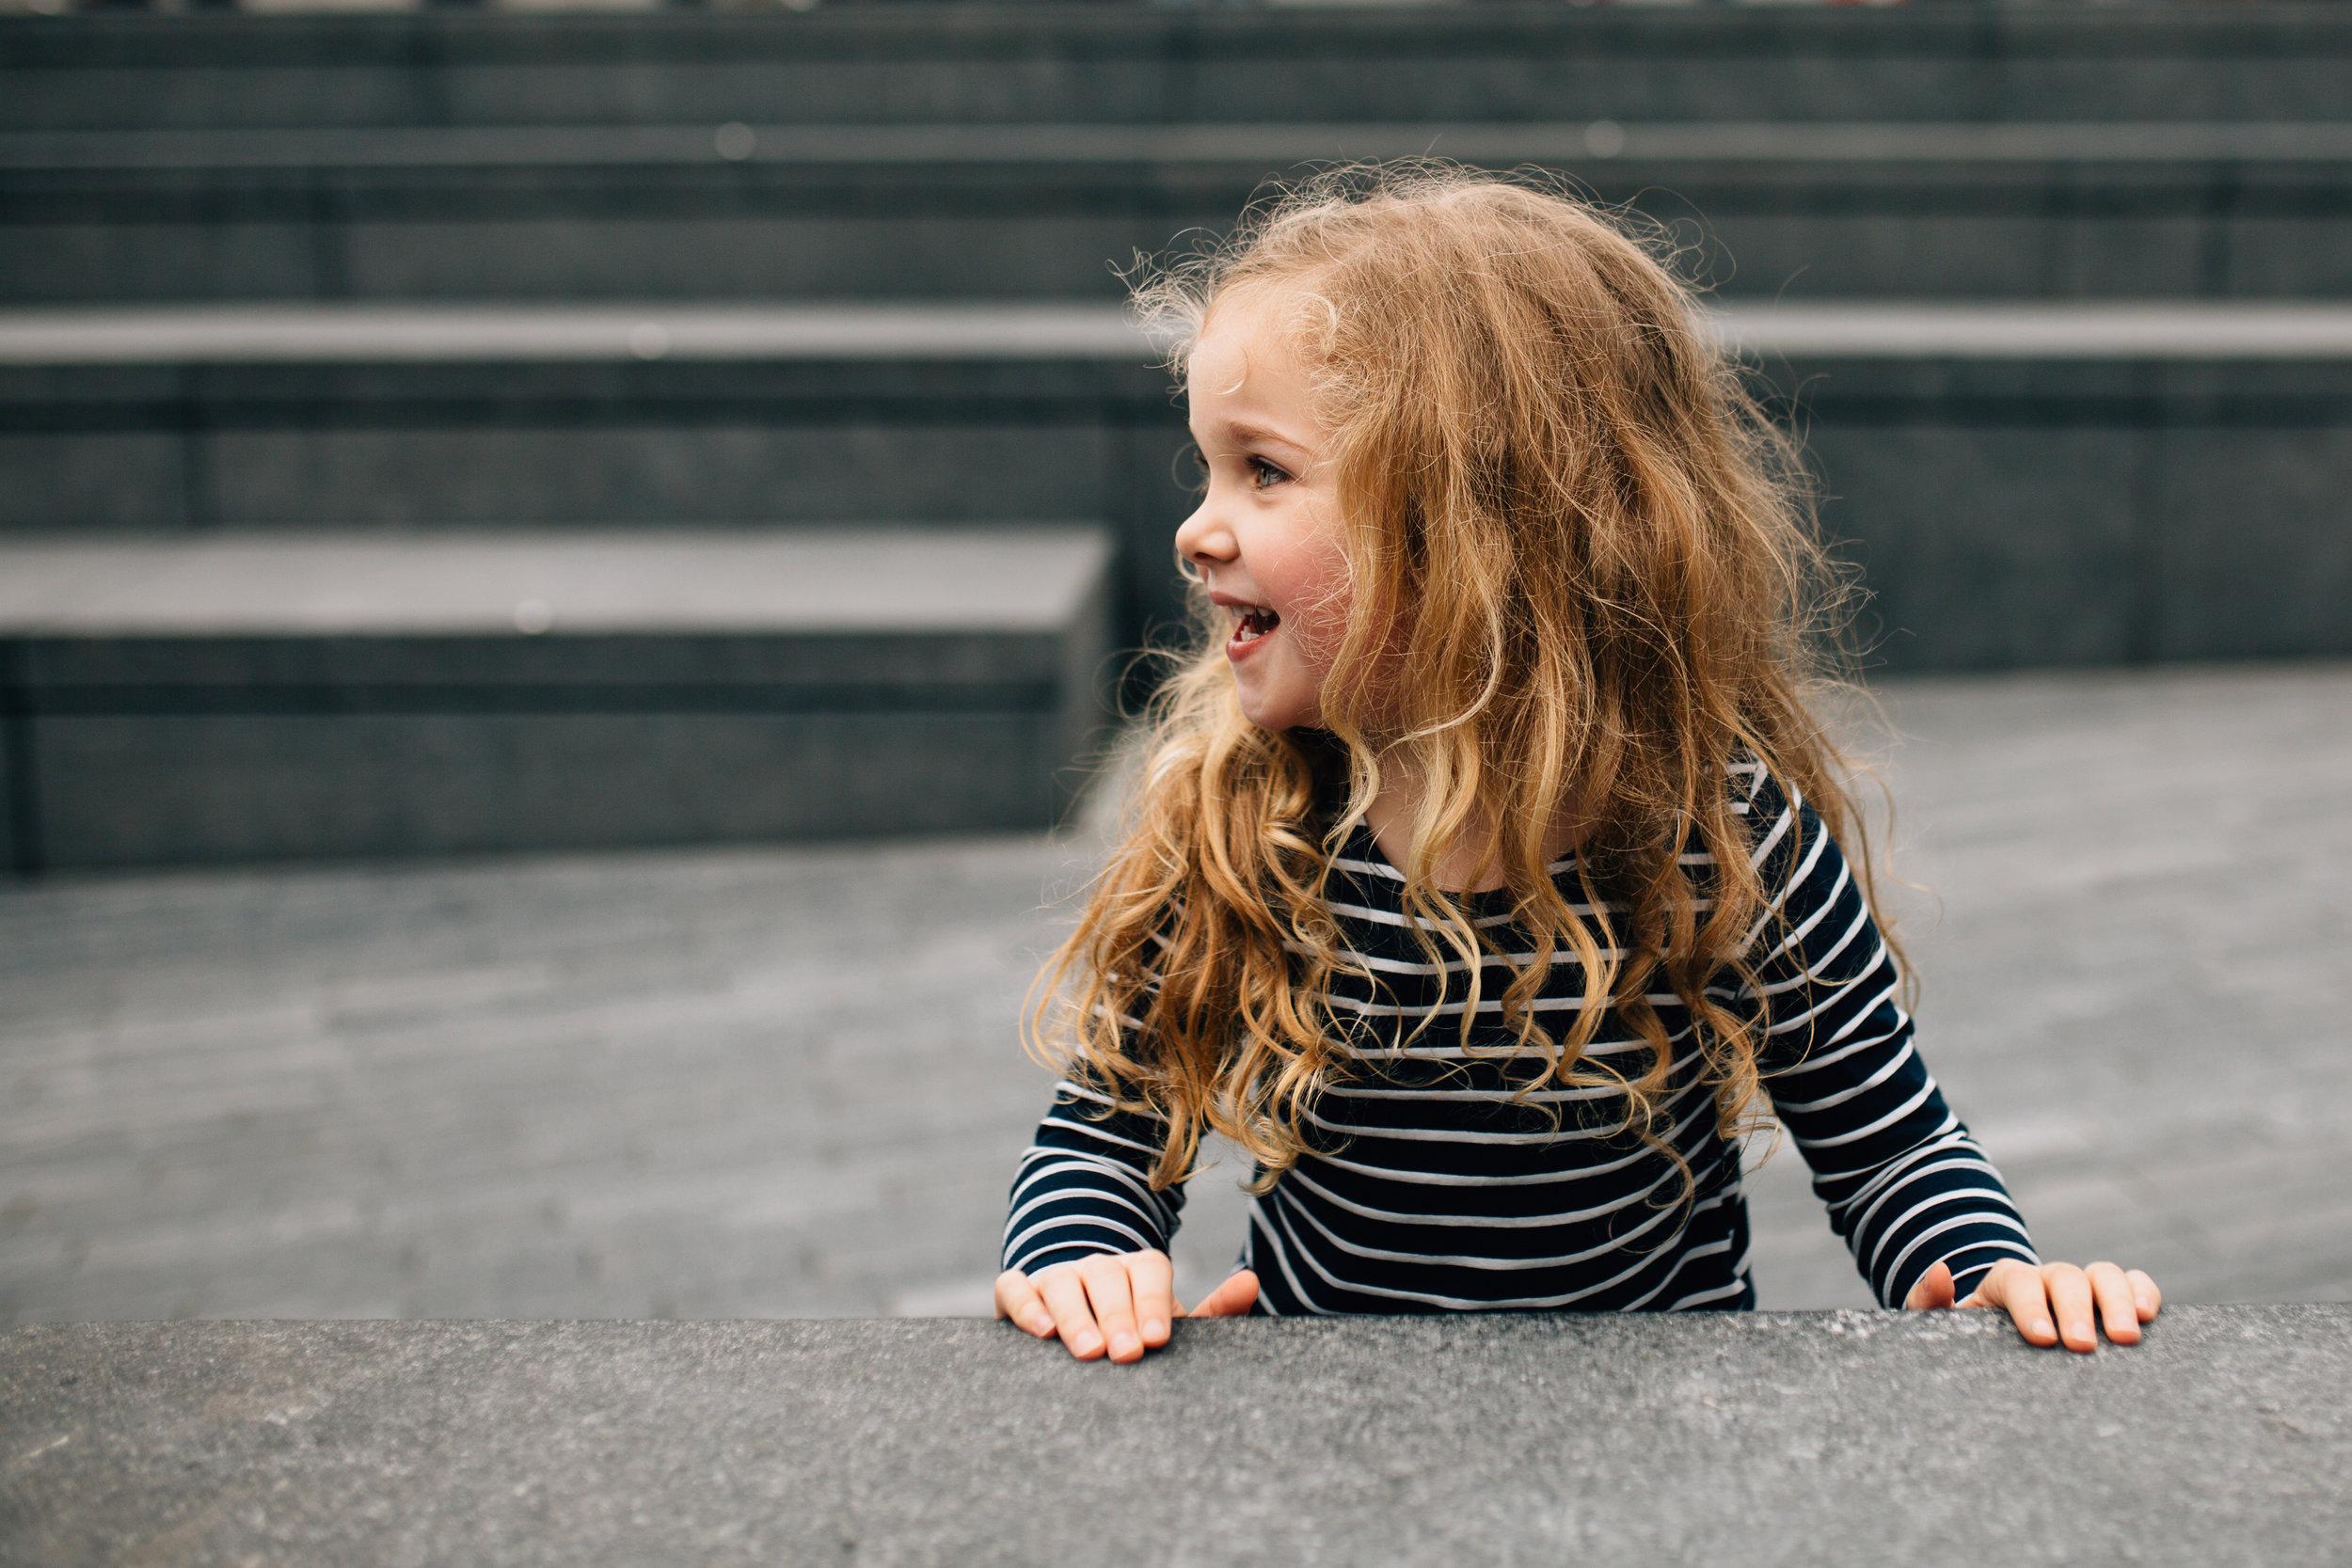 Girl outside City Hall River Thames London